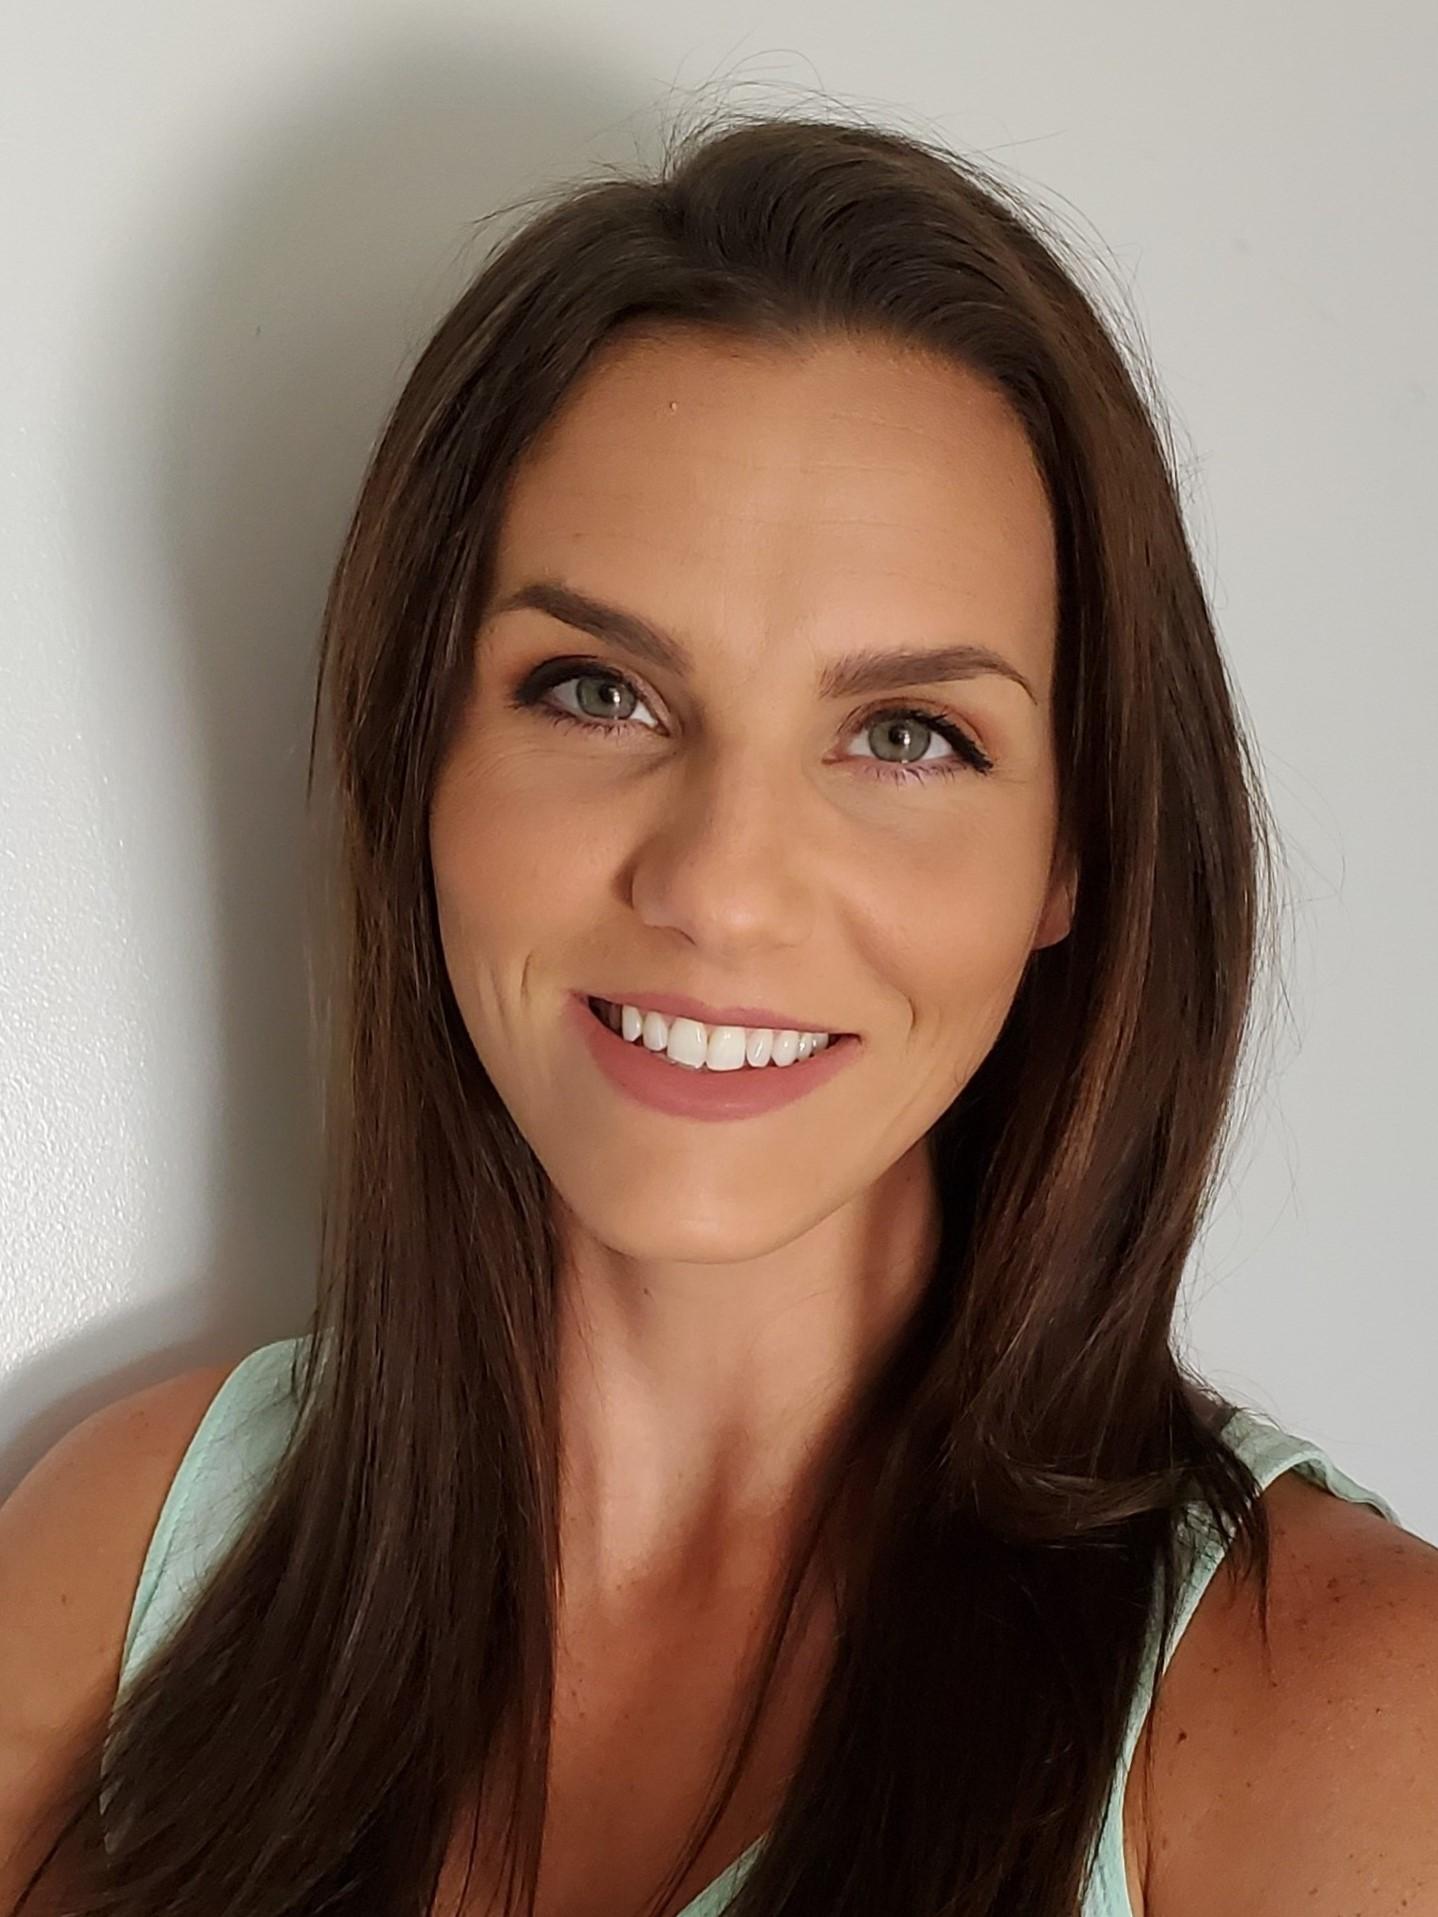 Mrs. Tara Waltz Image